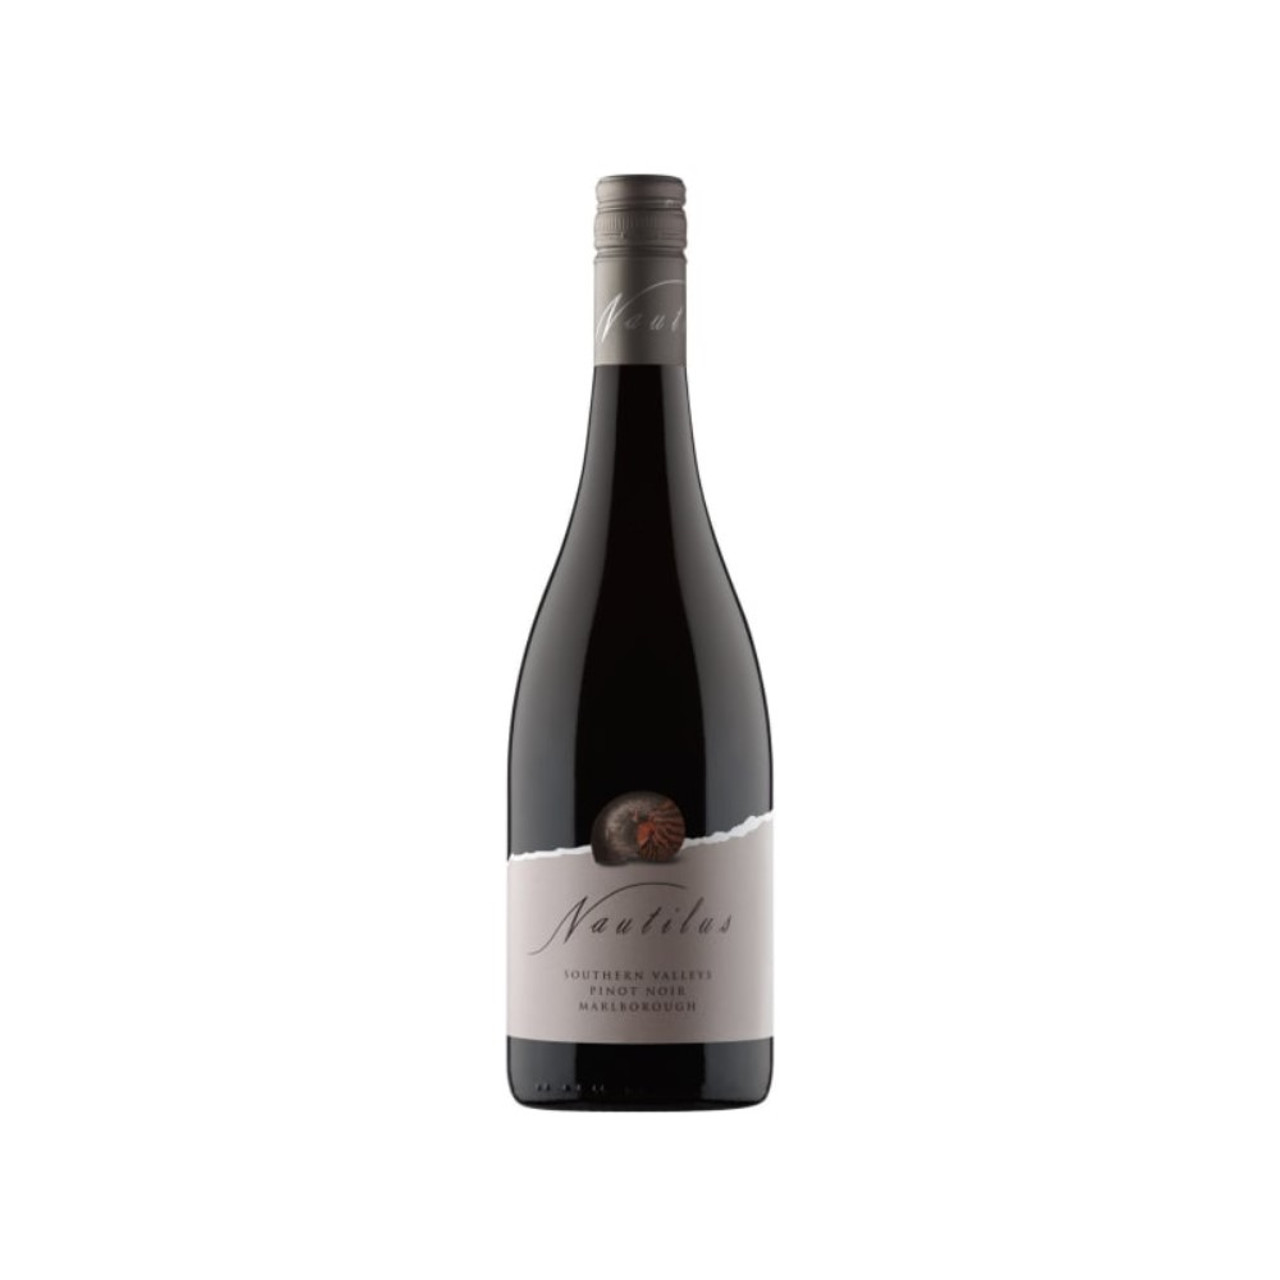 Nautilus, Southern Valleys Pinot Noir 2014